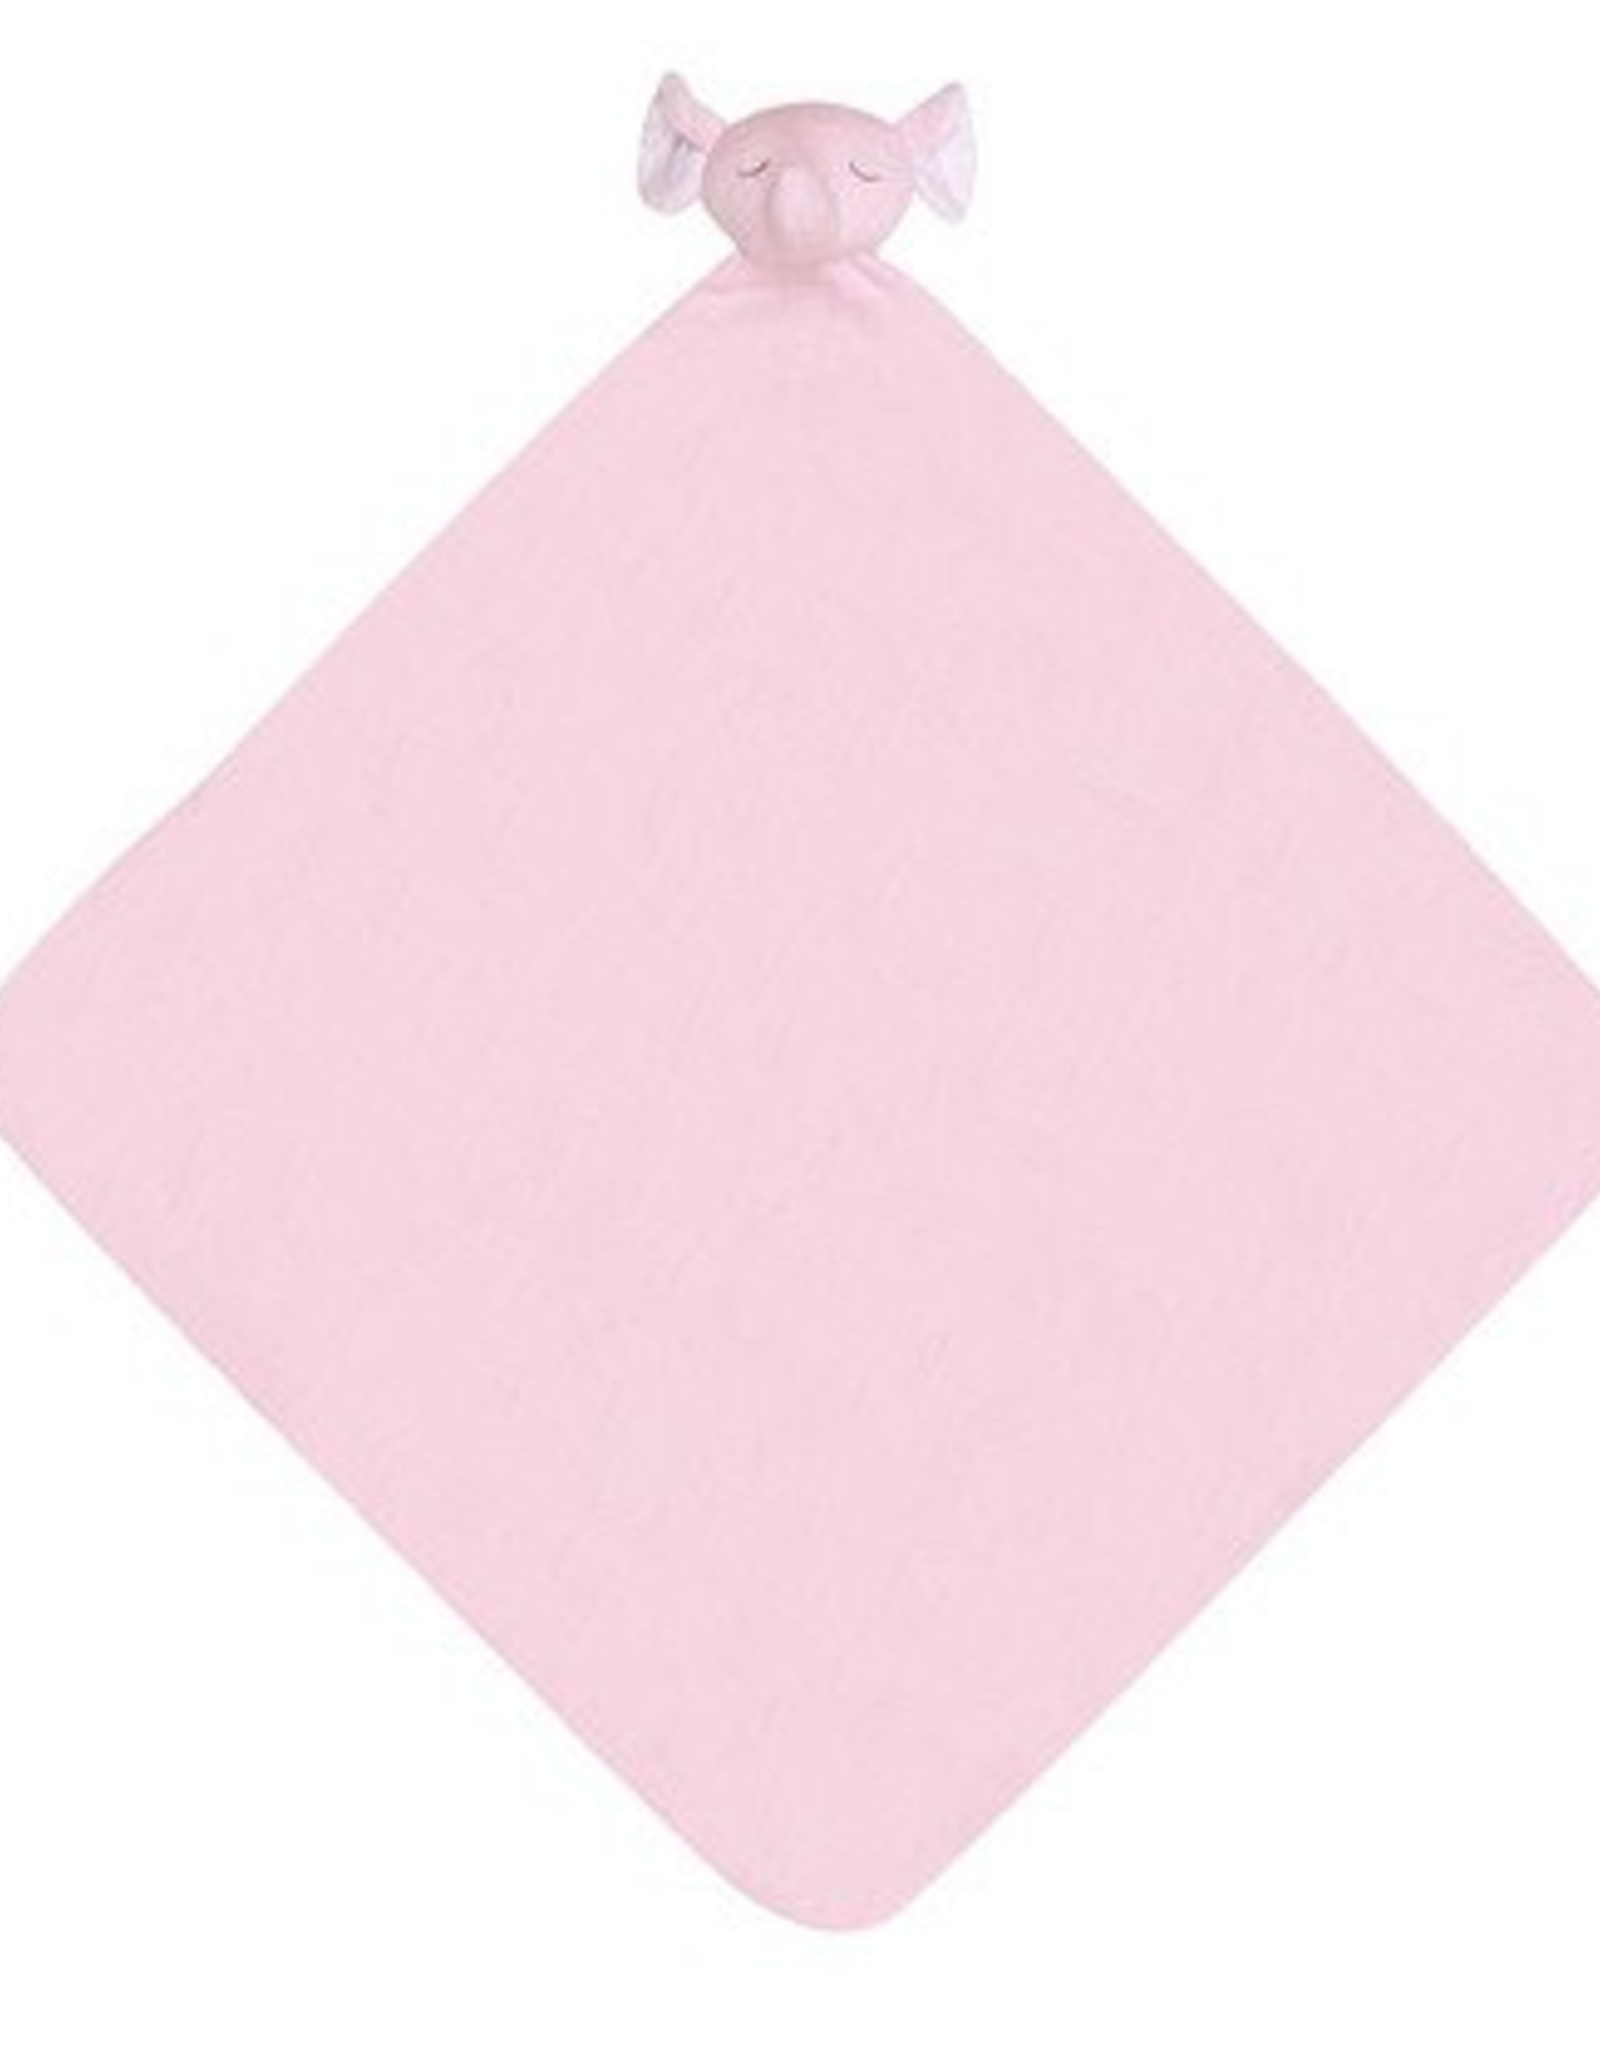 Angel Dear Napping Blanket Pink Elephant